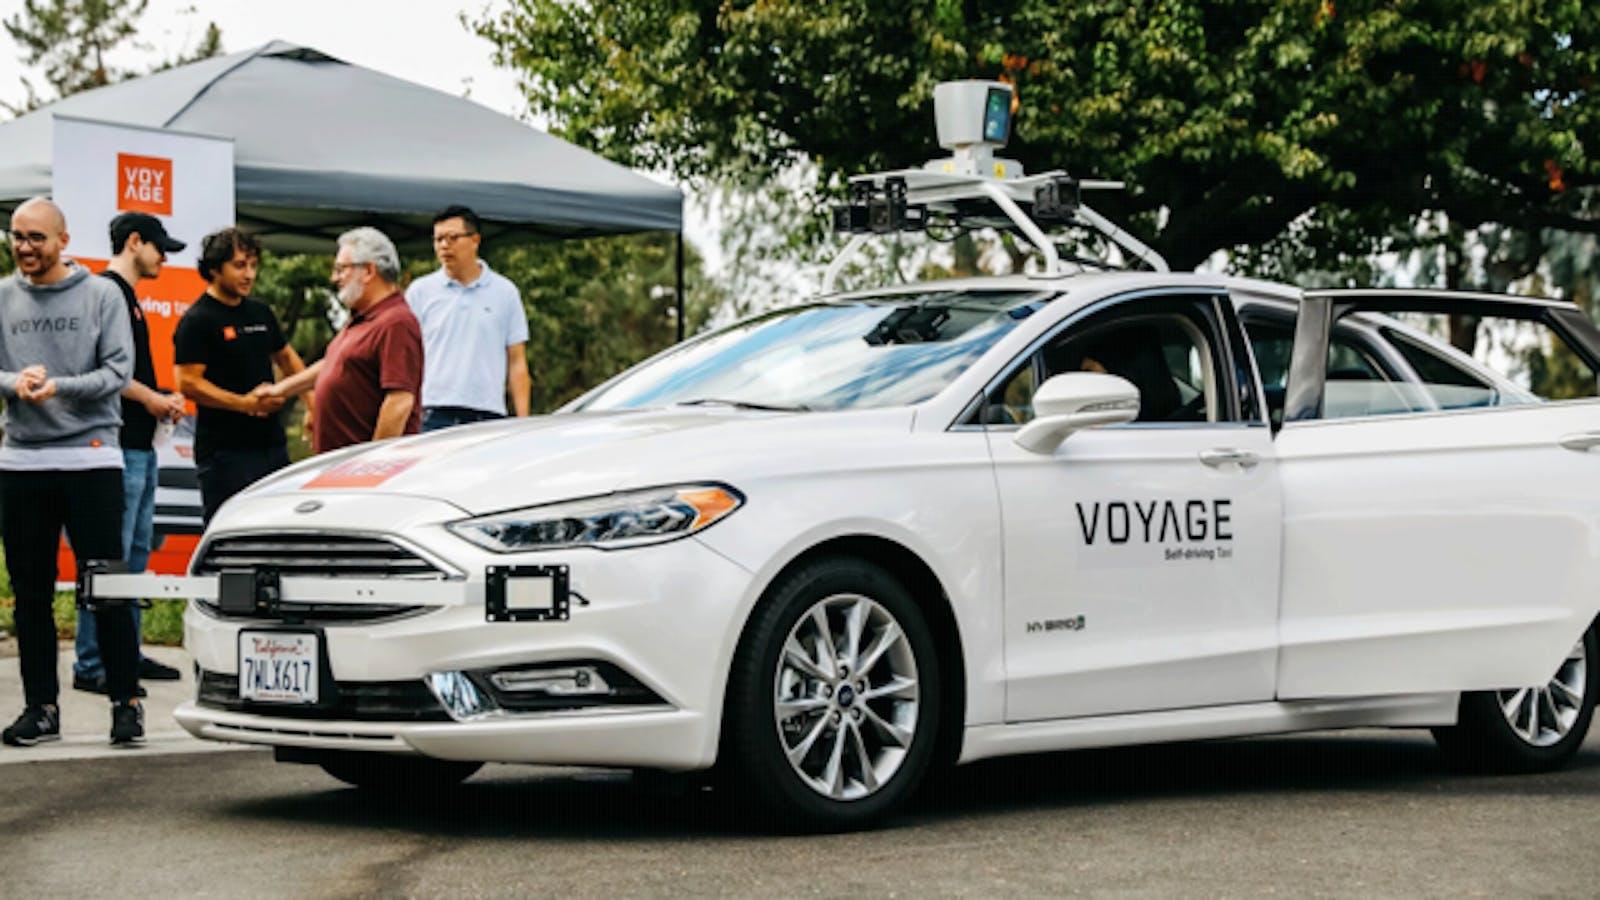 A Voyage self-driving car. Photo by Voyage.